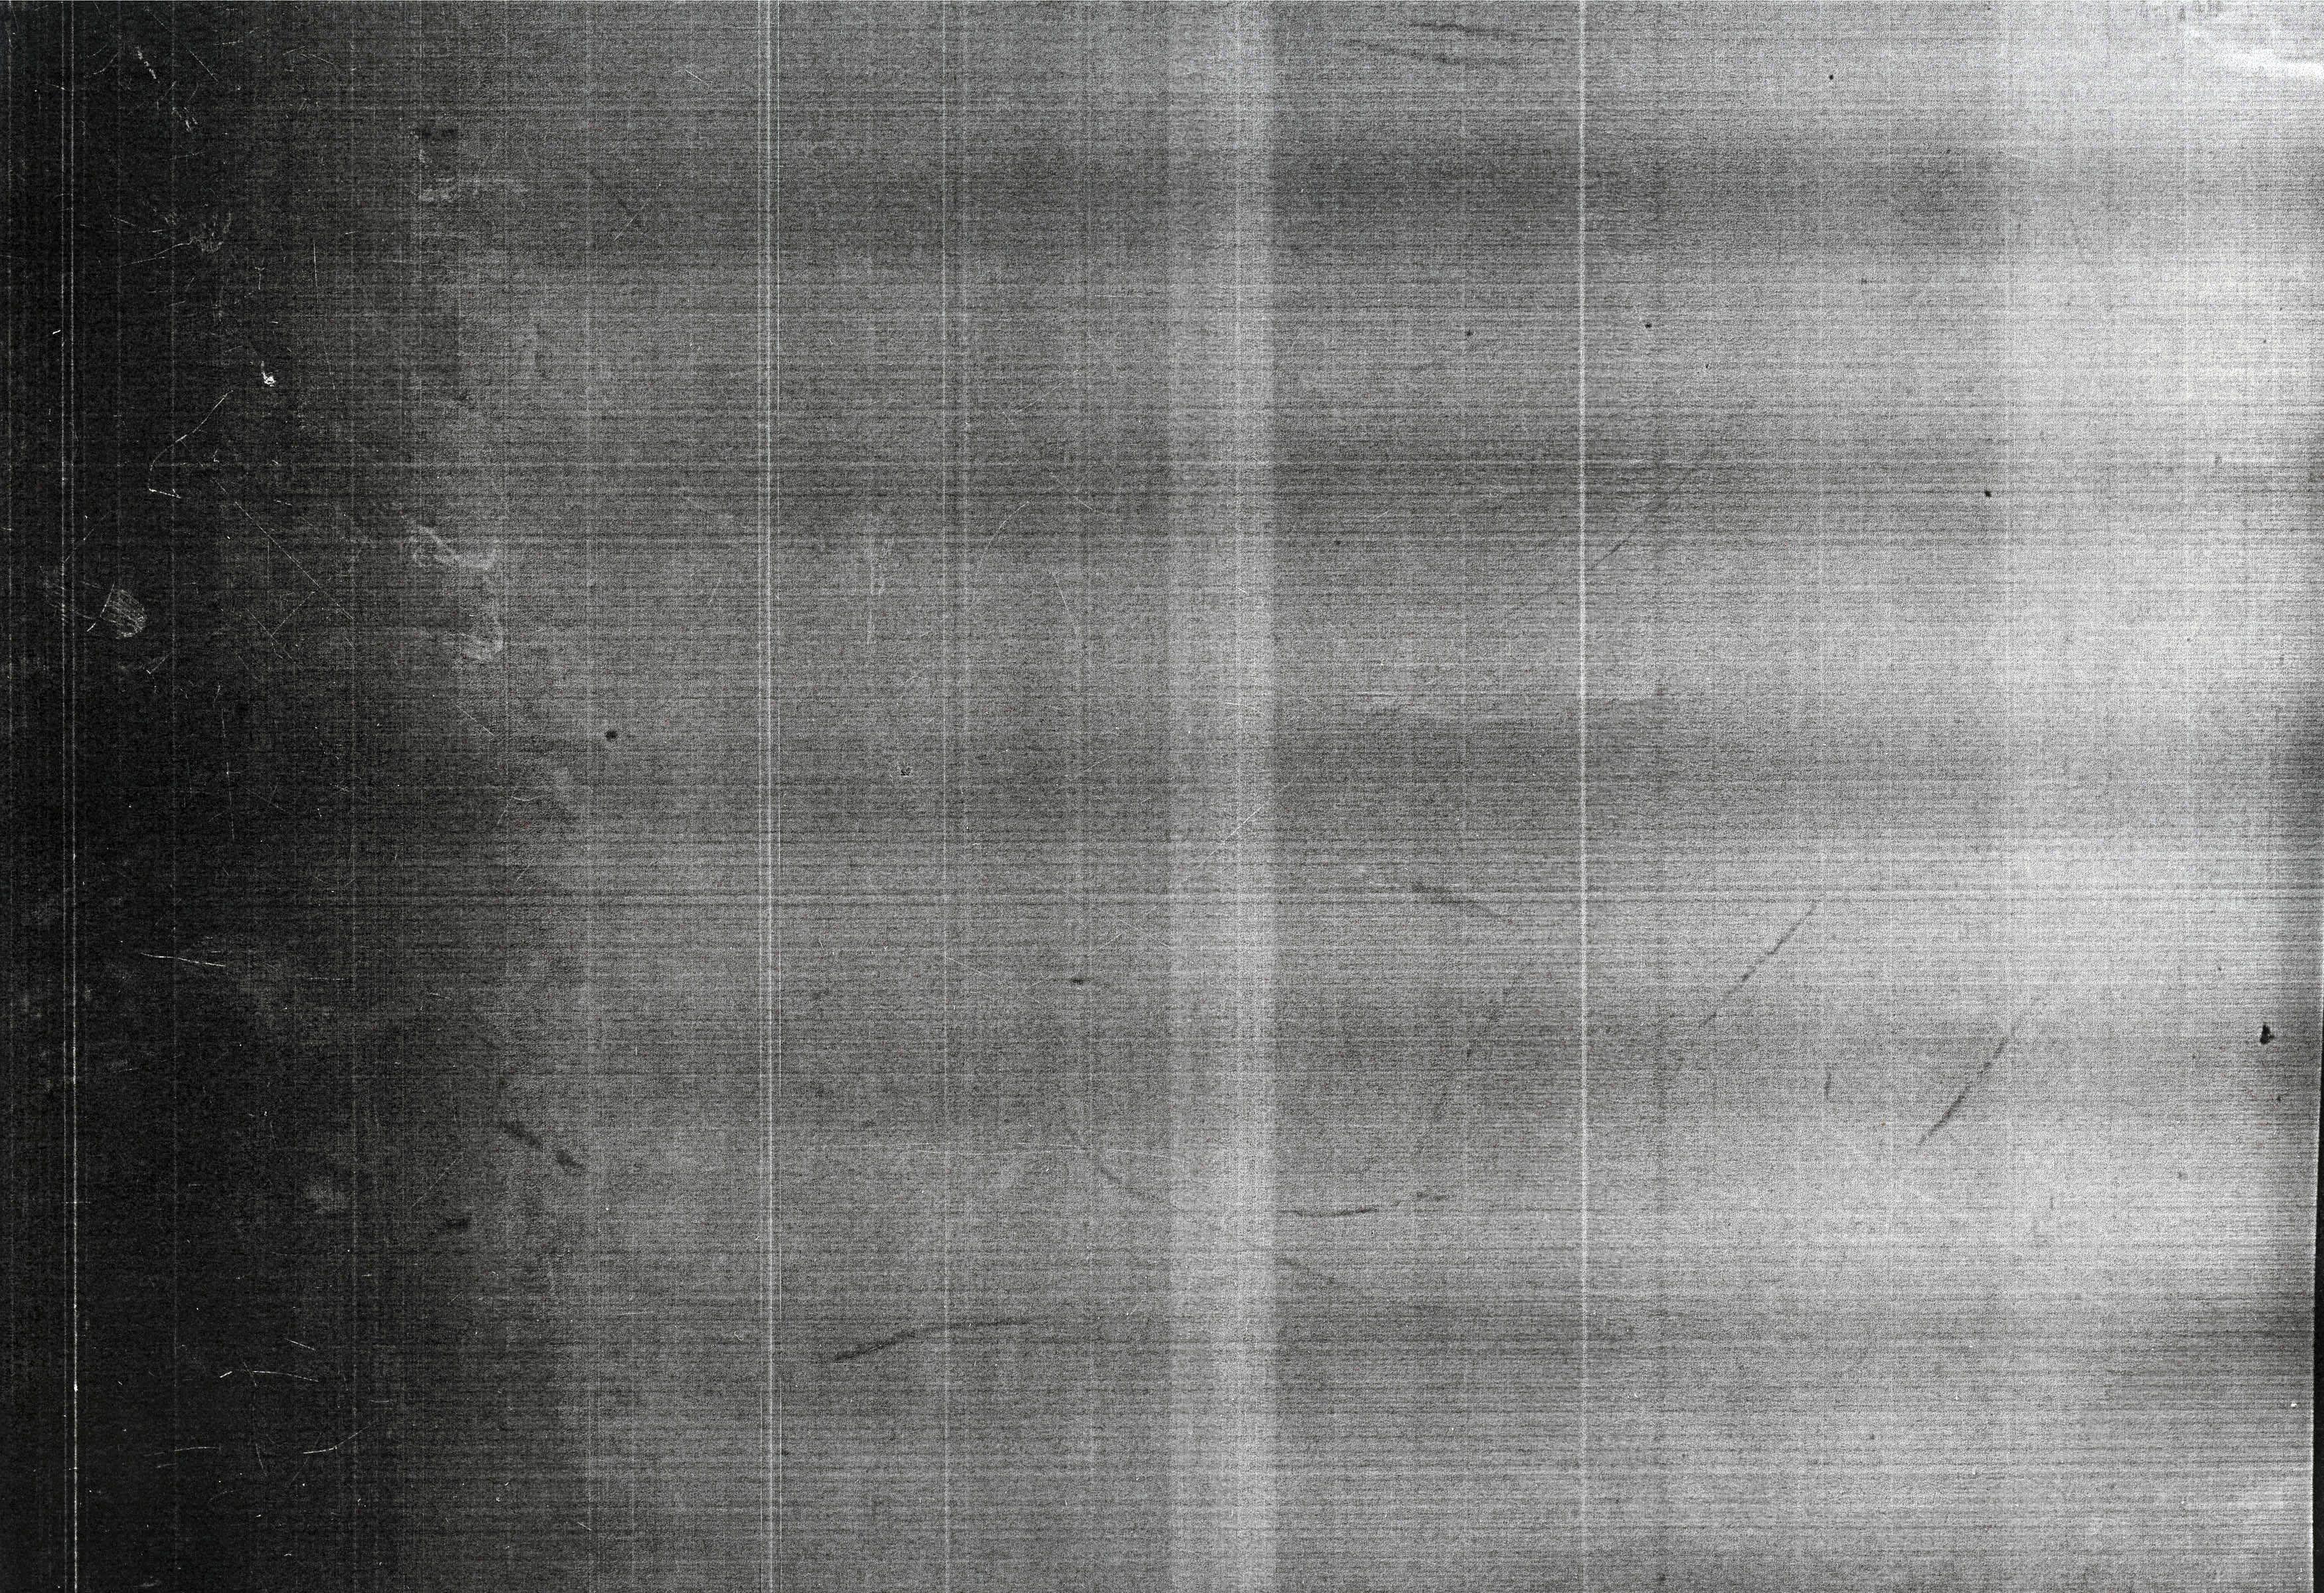 Xerox Texture 11 Photocopy Textures Vol 3 Texture Fabrik